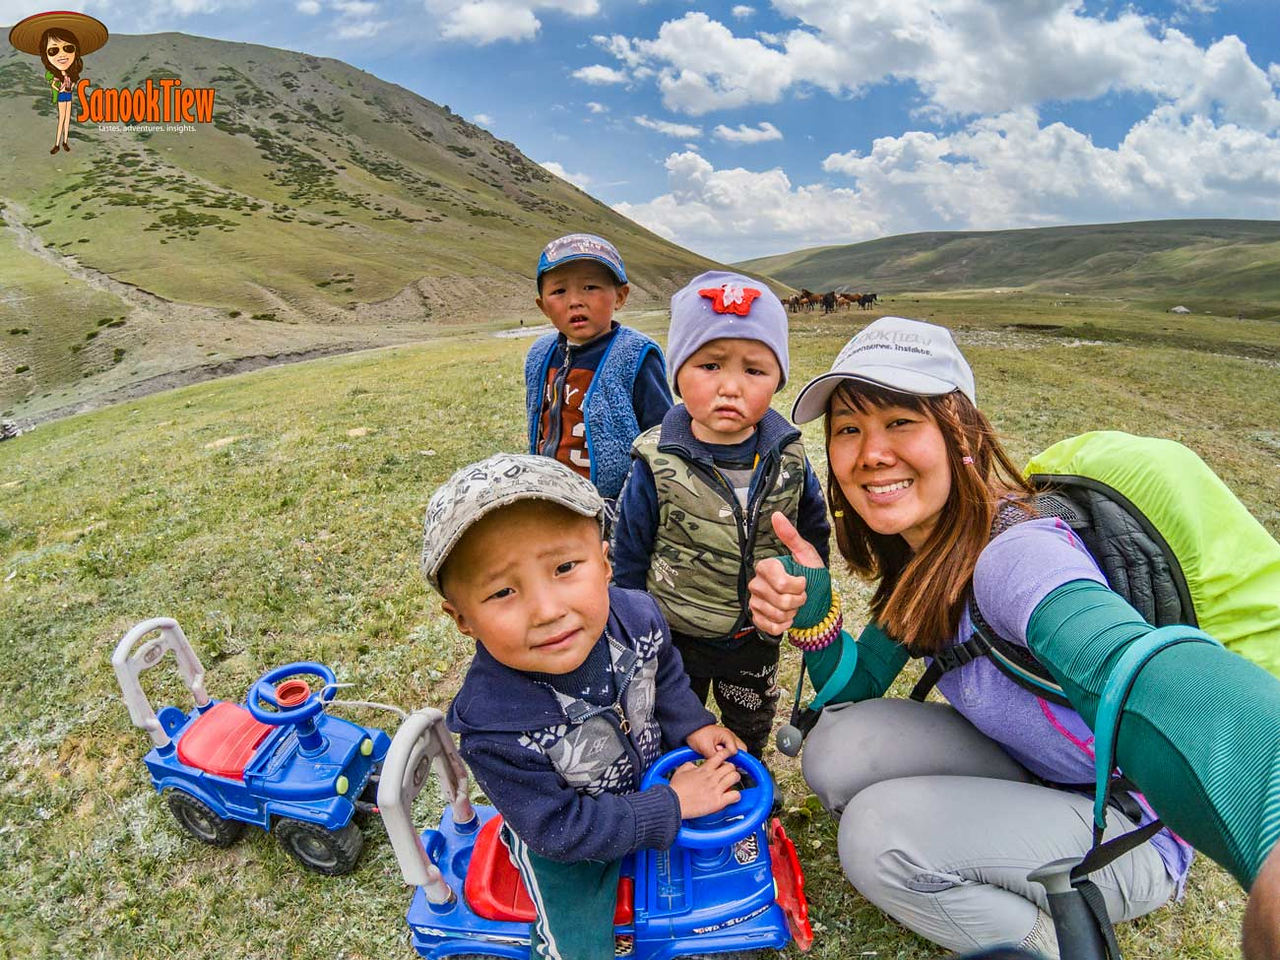 Sary Mogol Pass, Heights of Alay Trek, Sary Mogol, Krygyzstan คีร์กีซสถาน